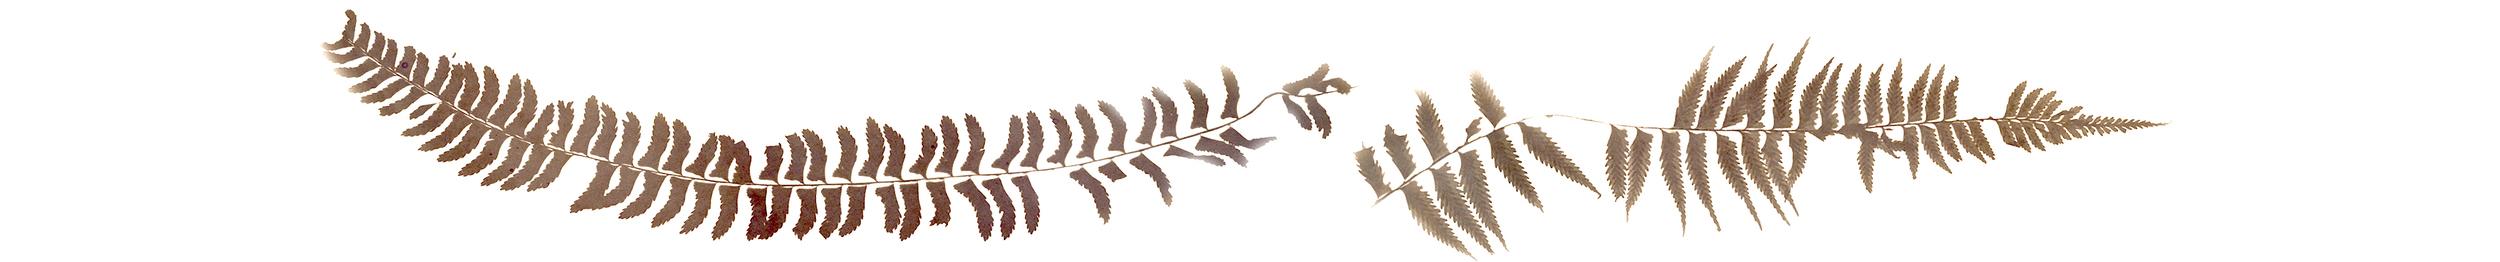 ferns in a line.jpg